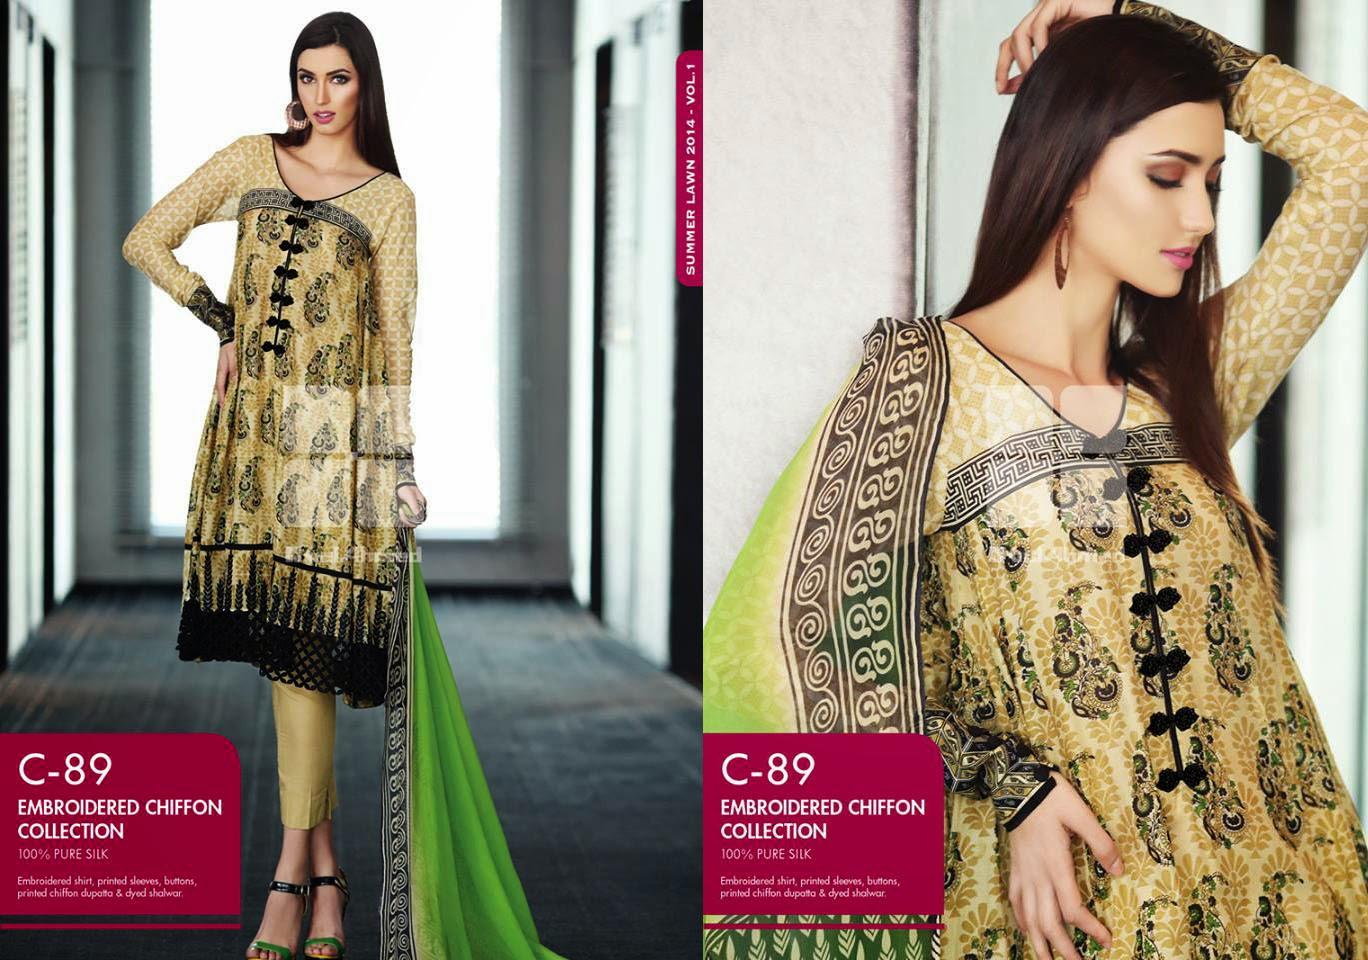 Shirt design ideas pakistani - 19 June 2014